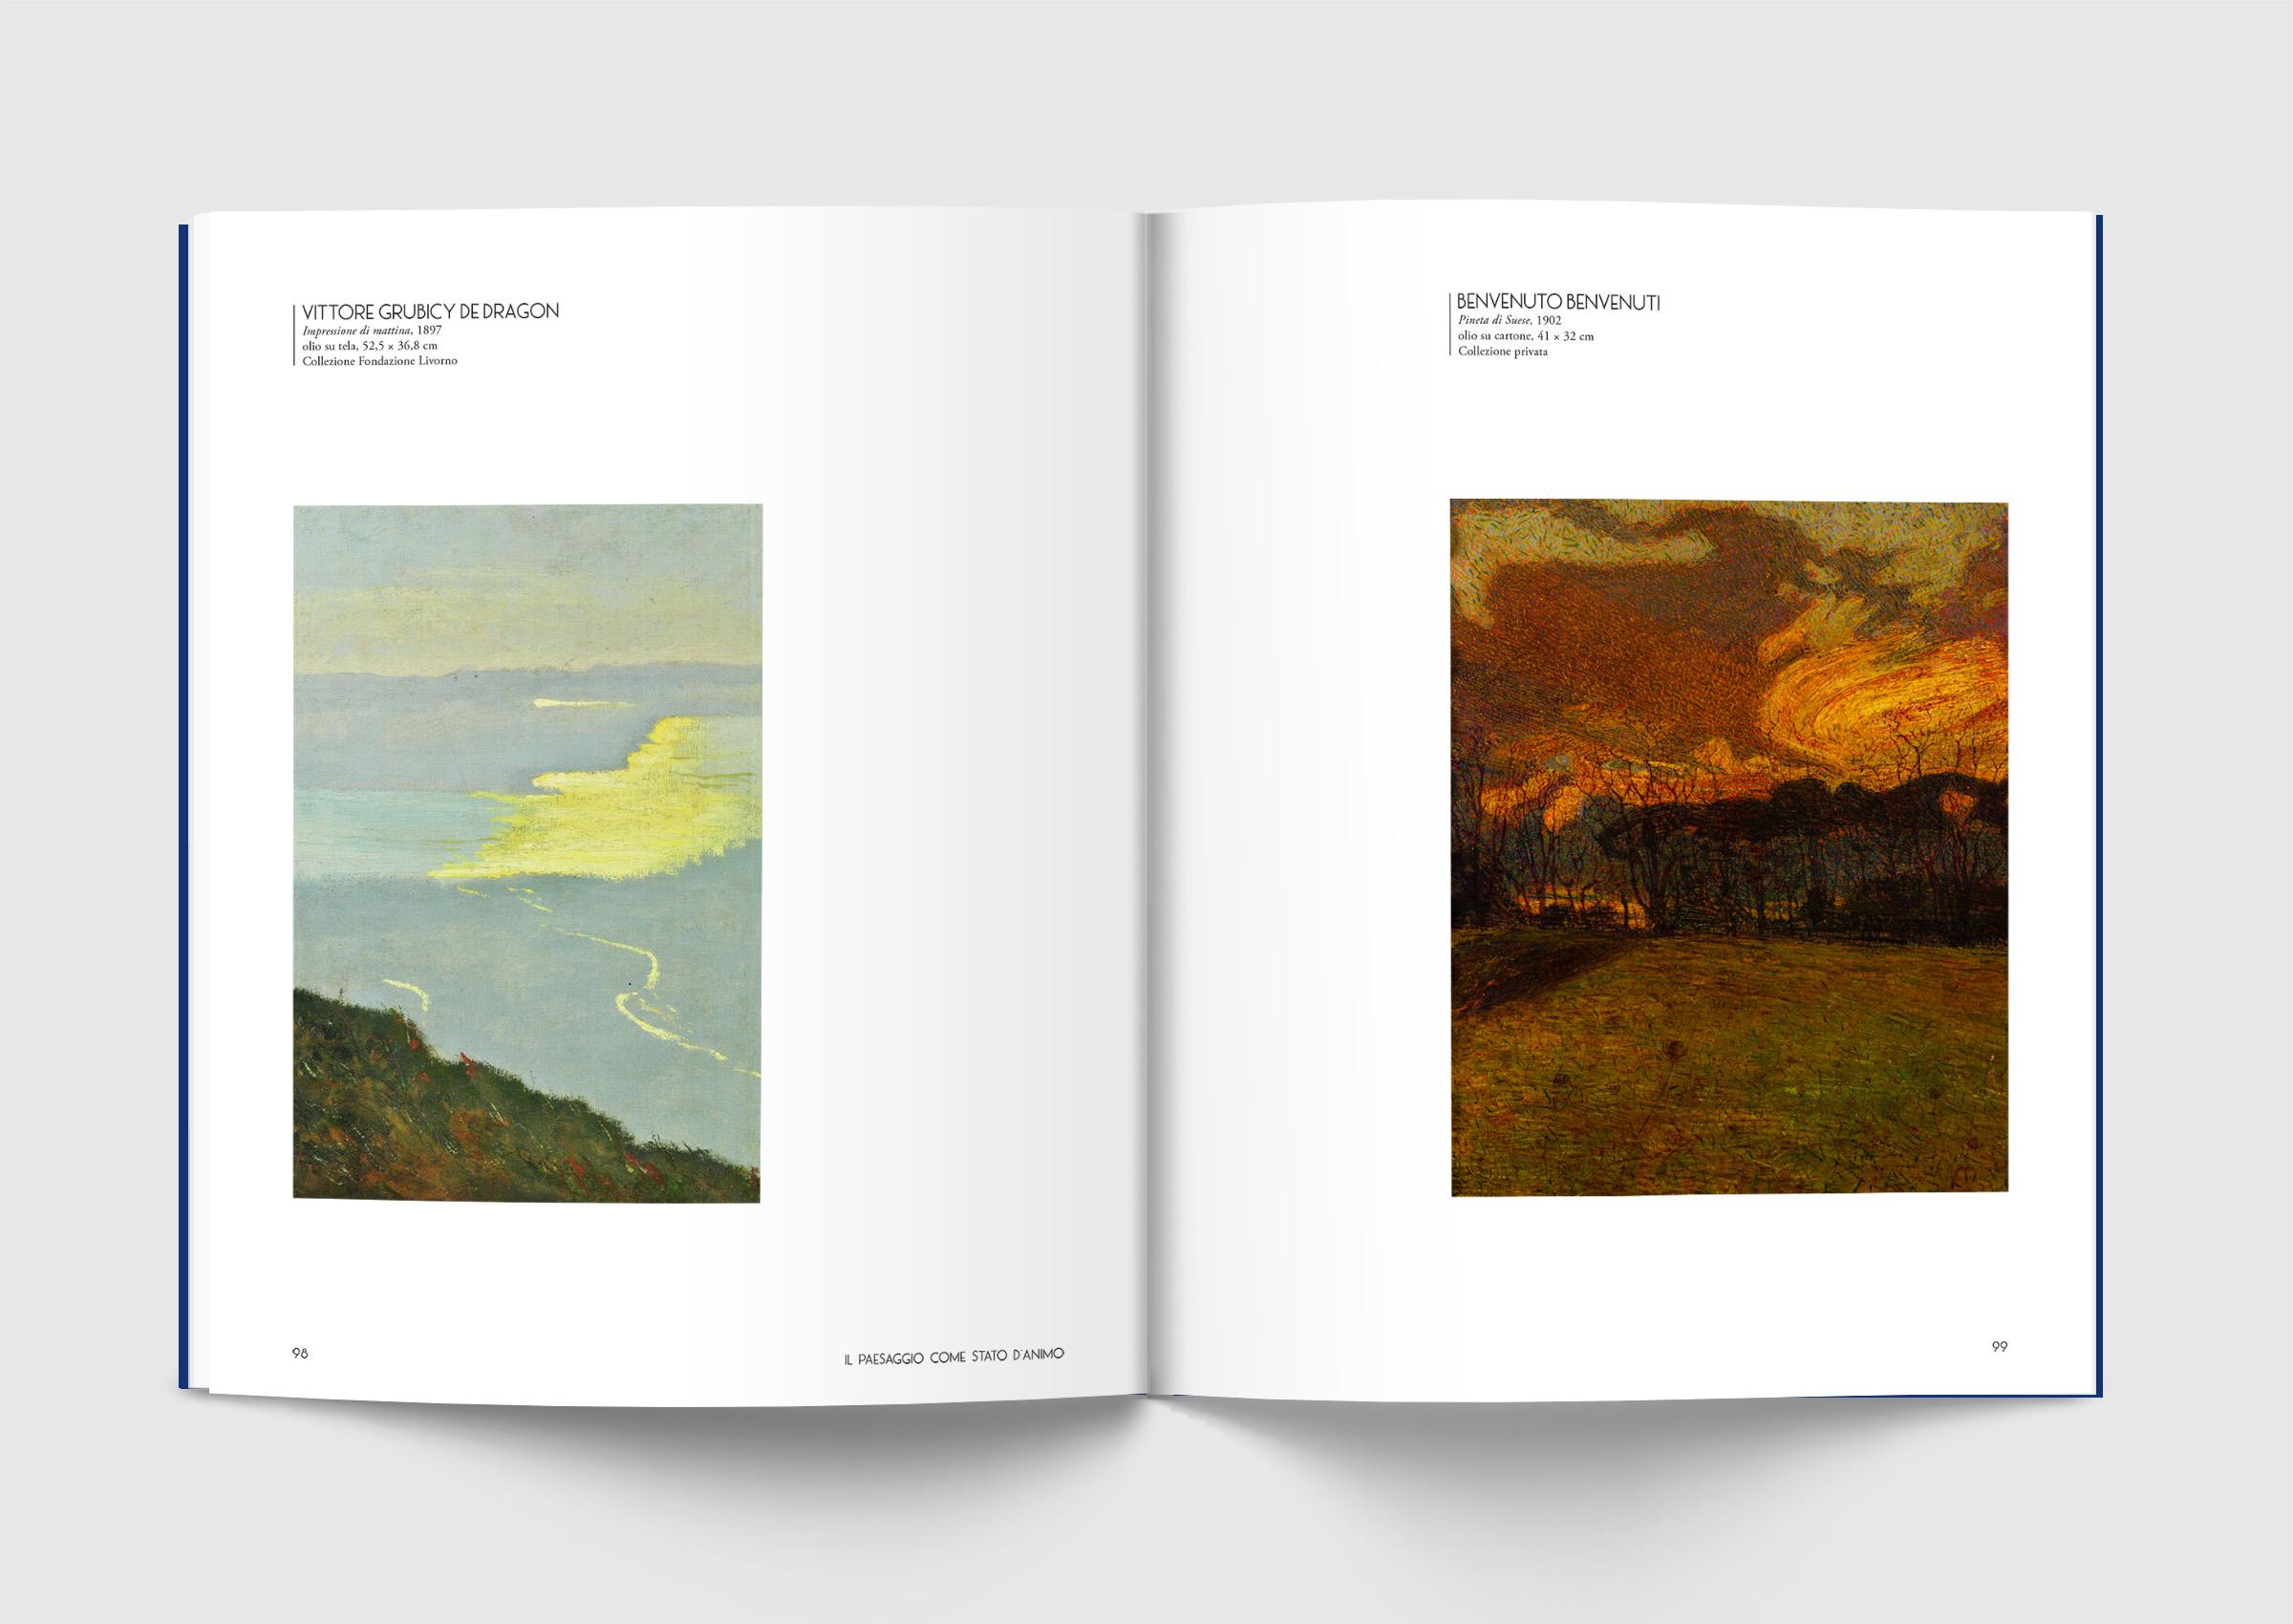 Catalogo Mostra, Arcadia Apocalisse, Palp, Pontedera, Design, Deferrari Modesti, Fotografia